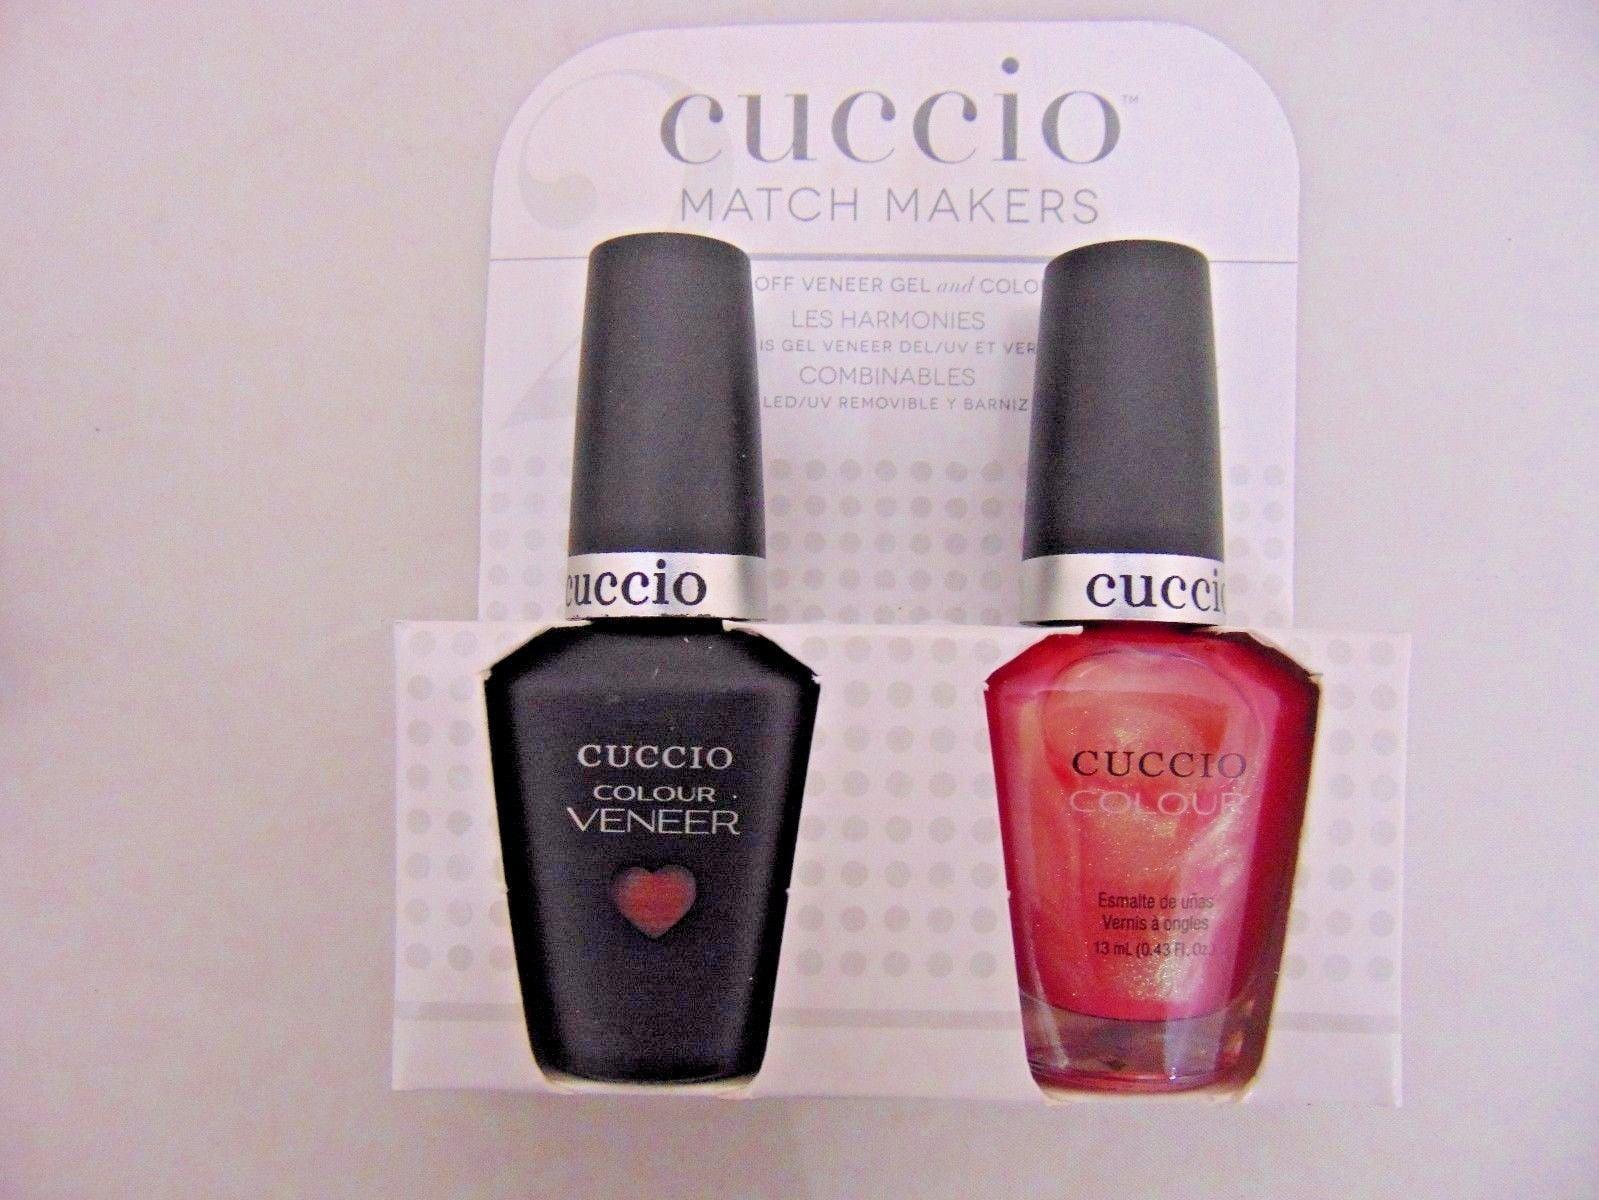 CUCCIO Veneer Match Makers Nail Polish, Smile - Walmart.com